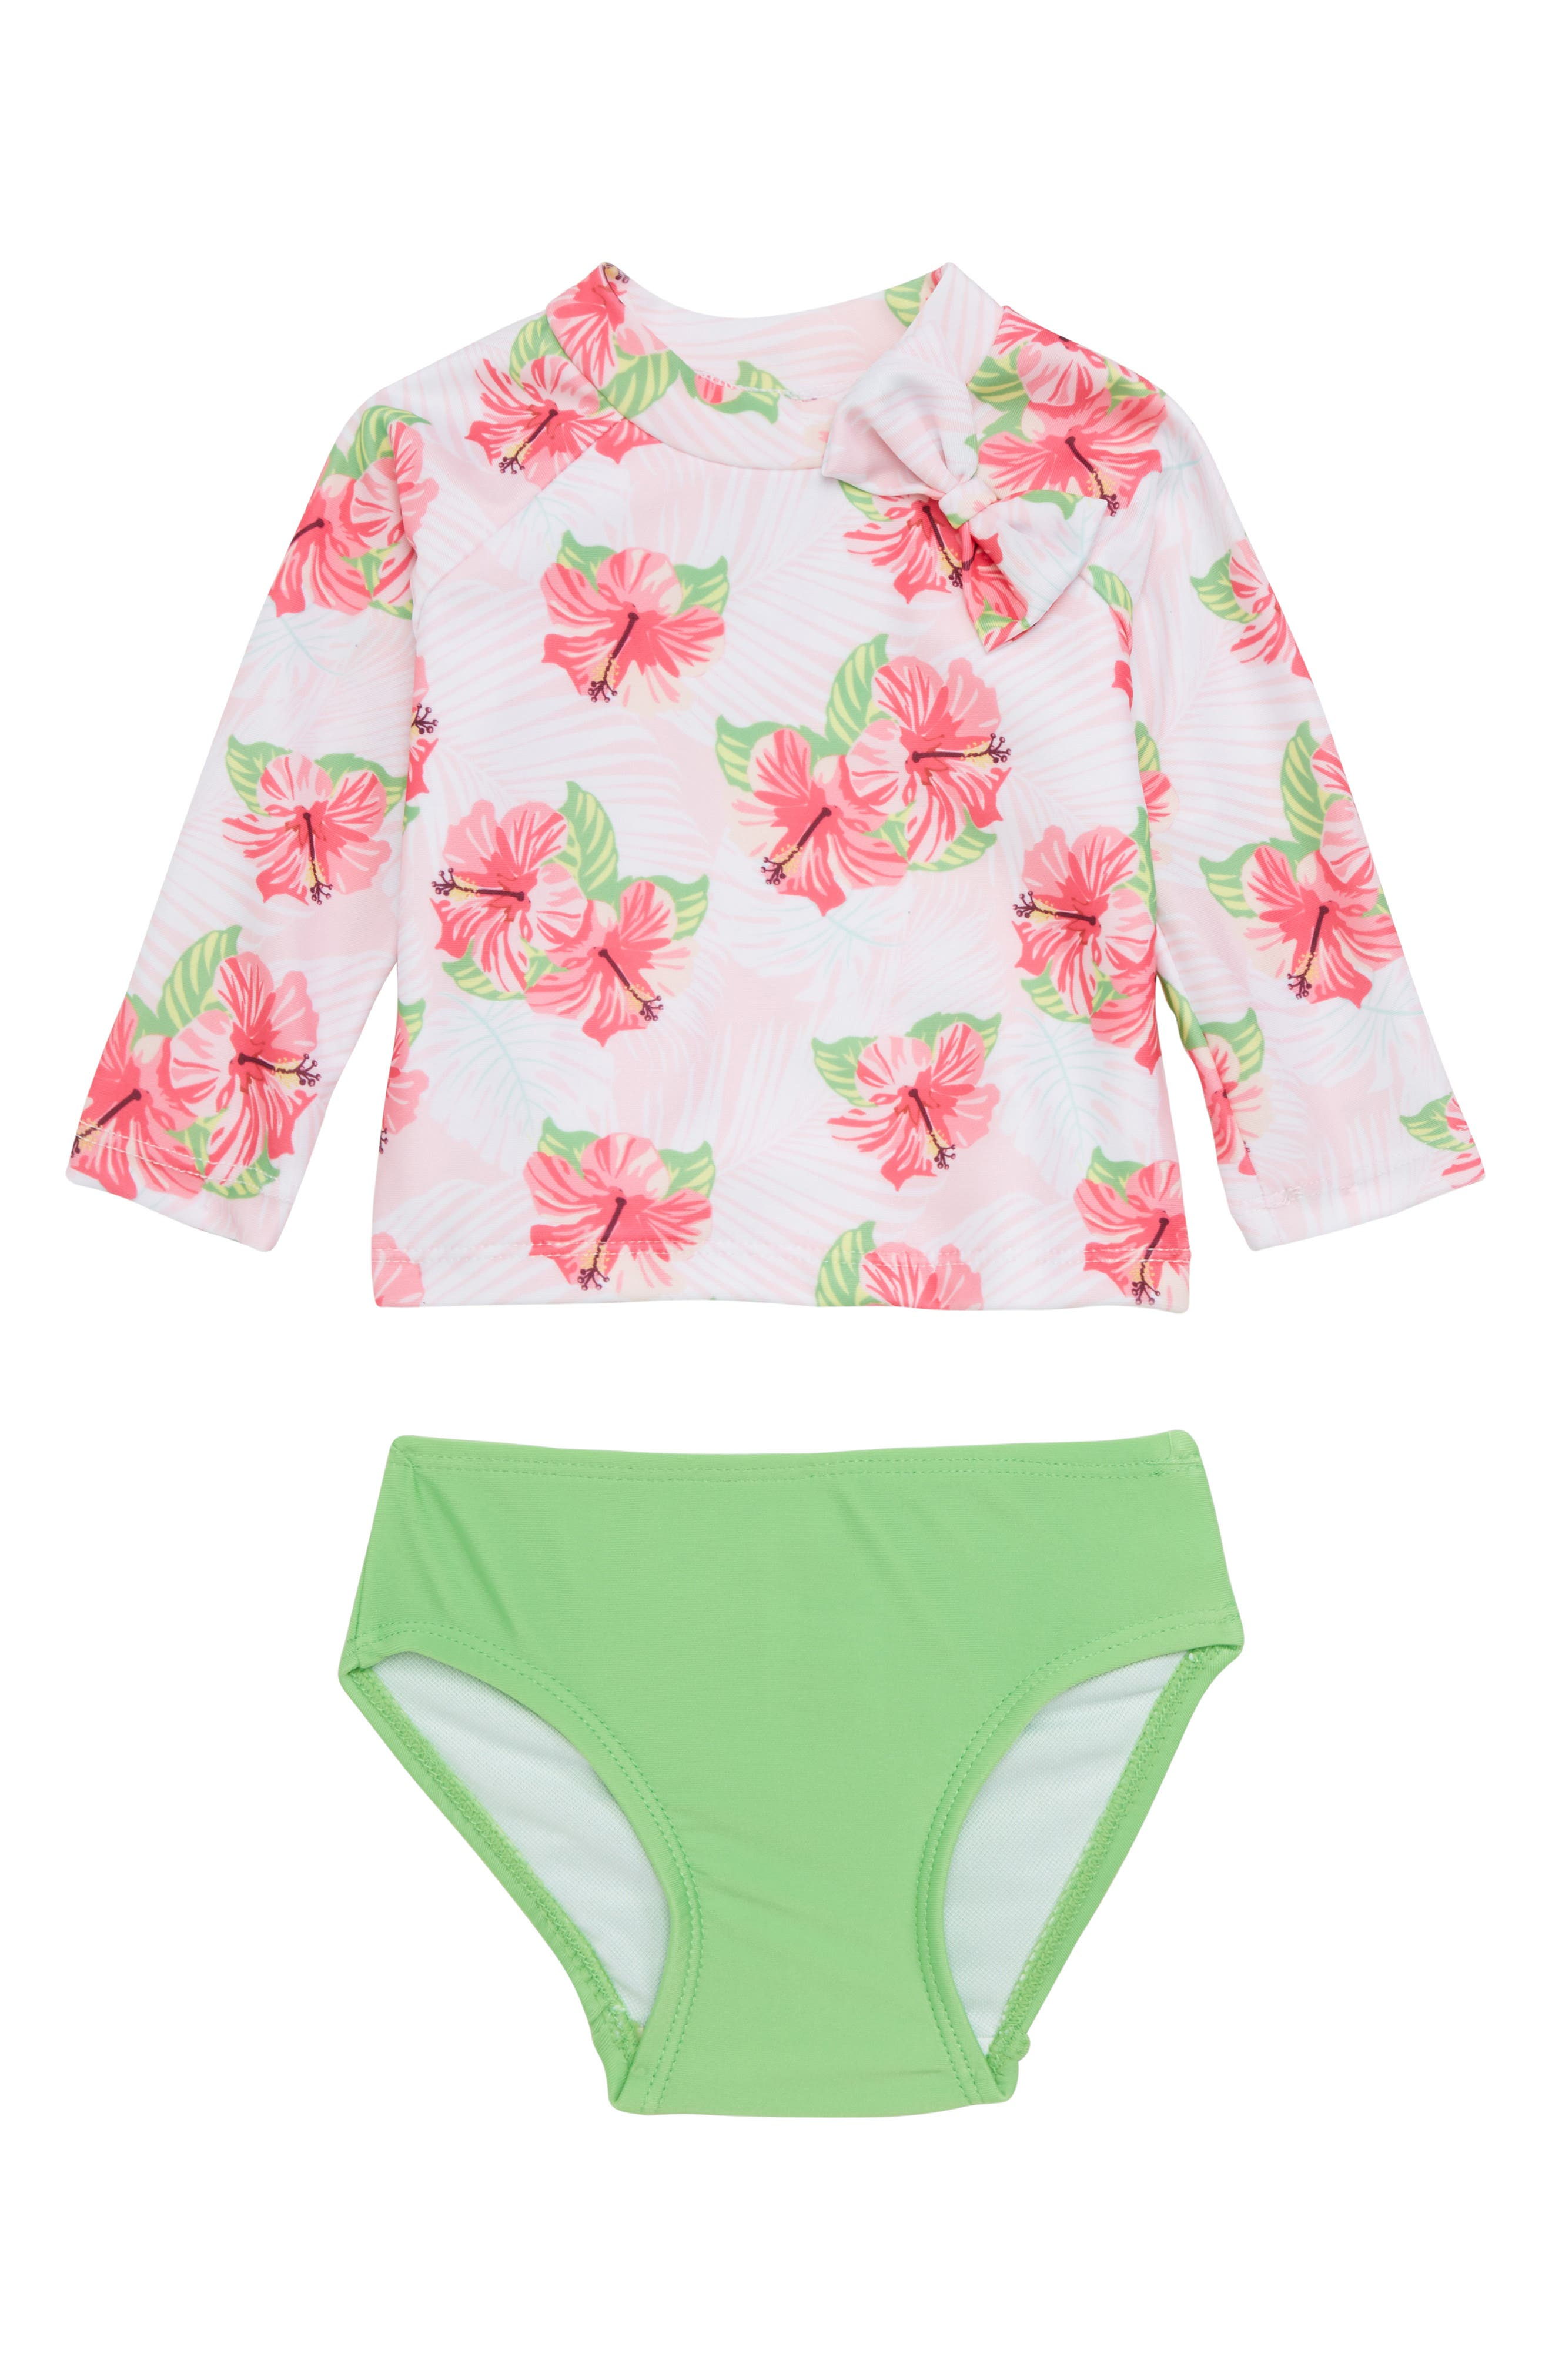 Hibiscus Splash Two-Piece Rashguard Swimsuit,                             Main thumbnail 1, color,                             699